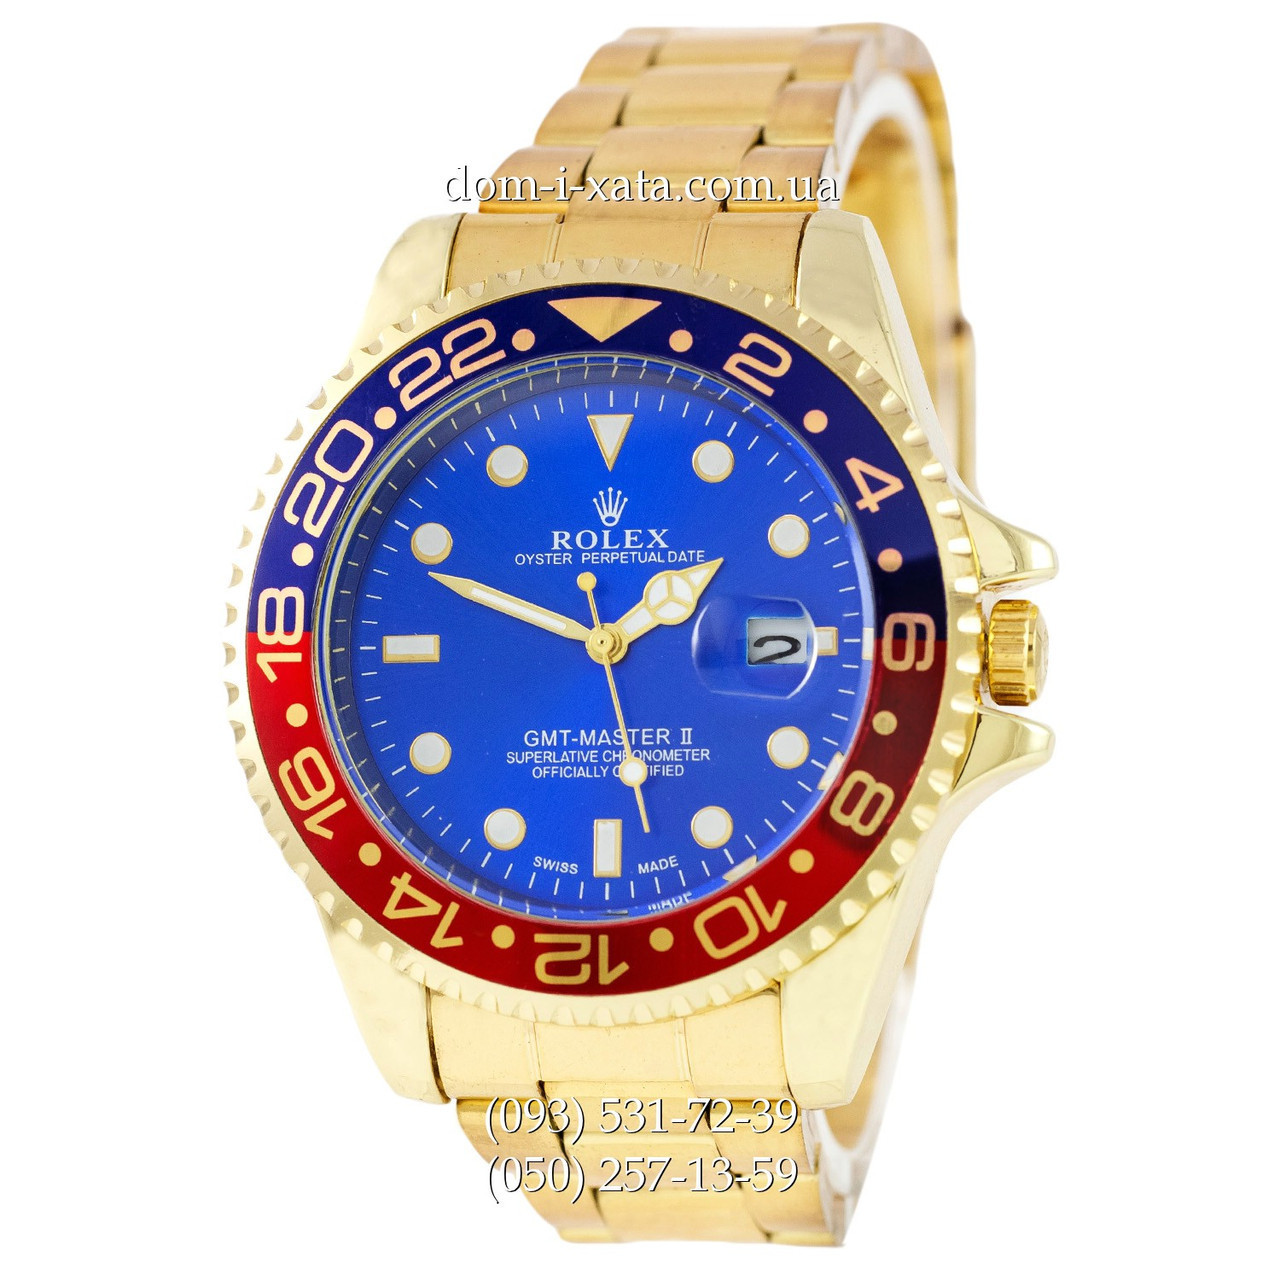 Мужские часы Rolex GMT-Master II Quarts Gold-Red-Blue, кварцевые часы af4cd119baf